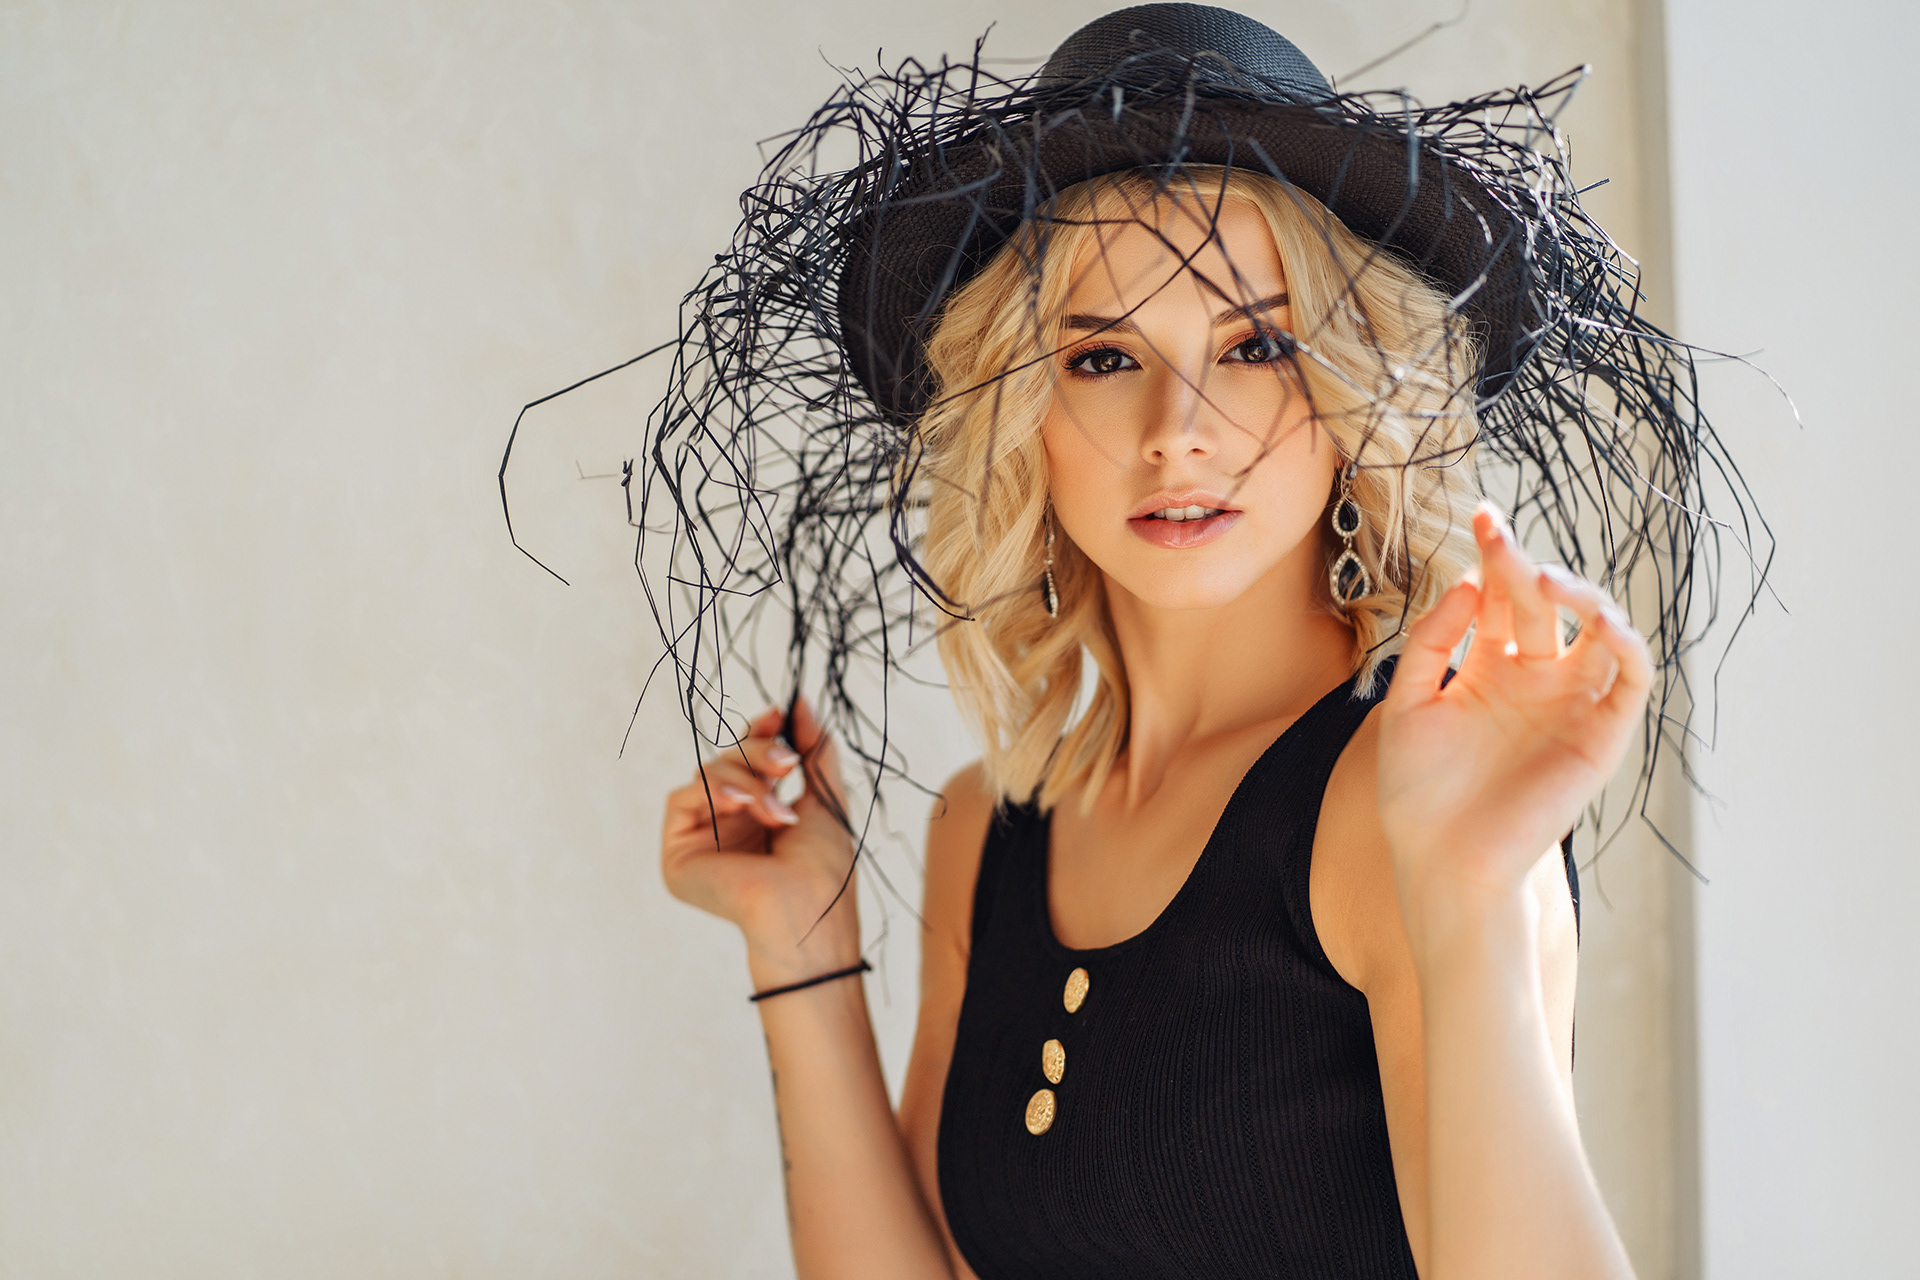 Angelina Aisman Max Klipa Women Model Blonde Hat Parted Lips Black Top Bare Shoulders Women Indoors  1920x1280